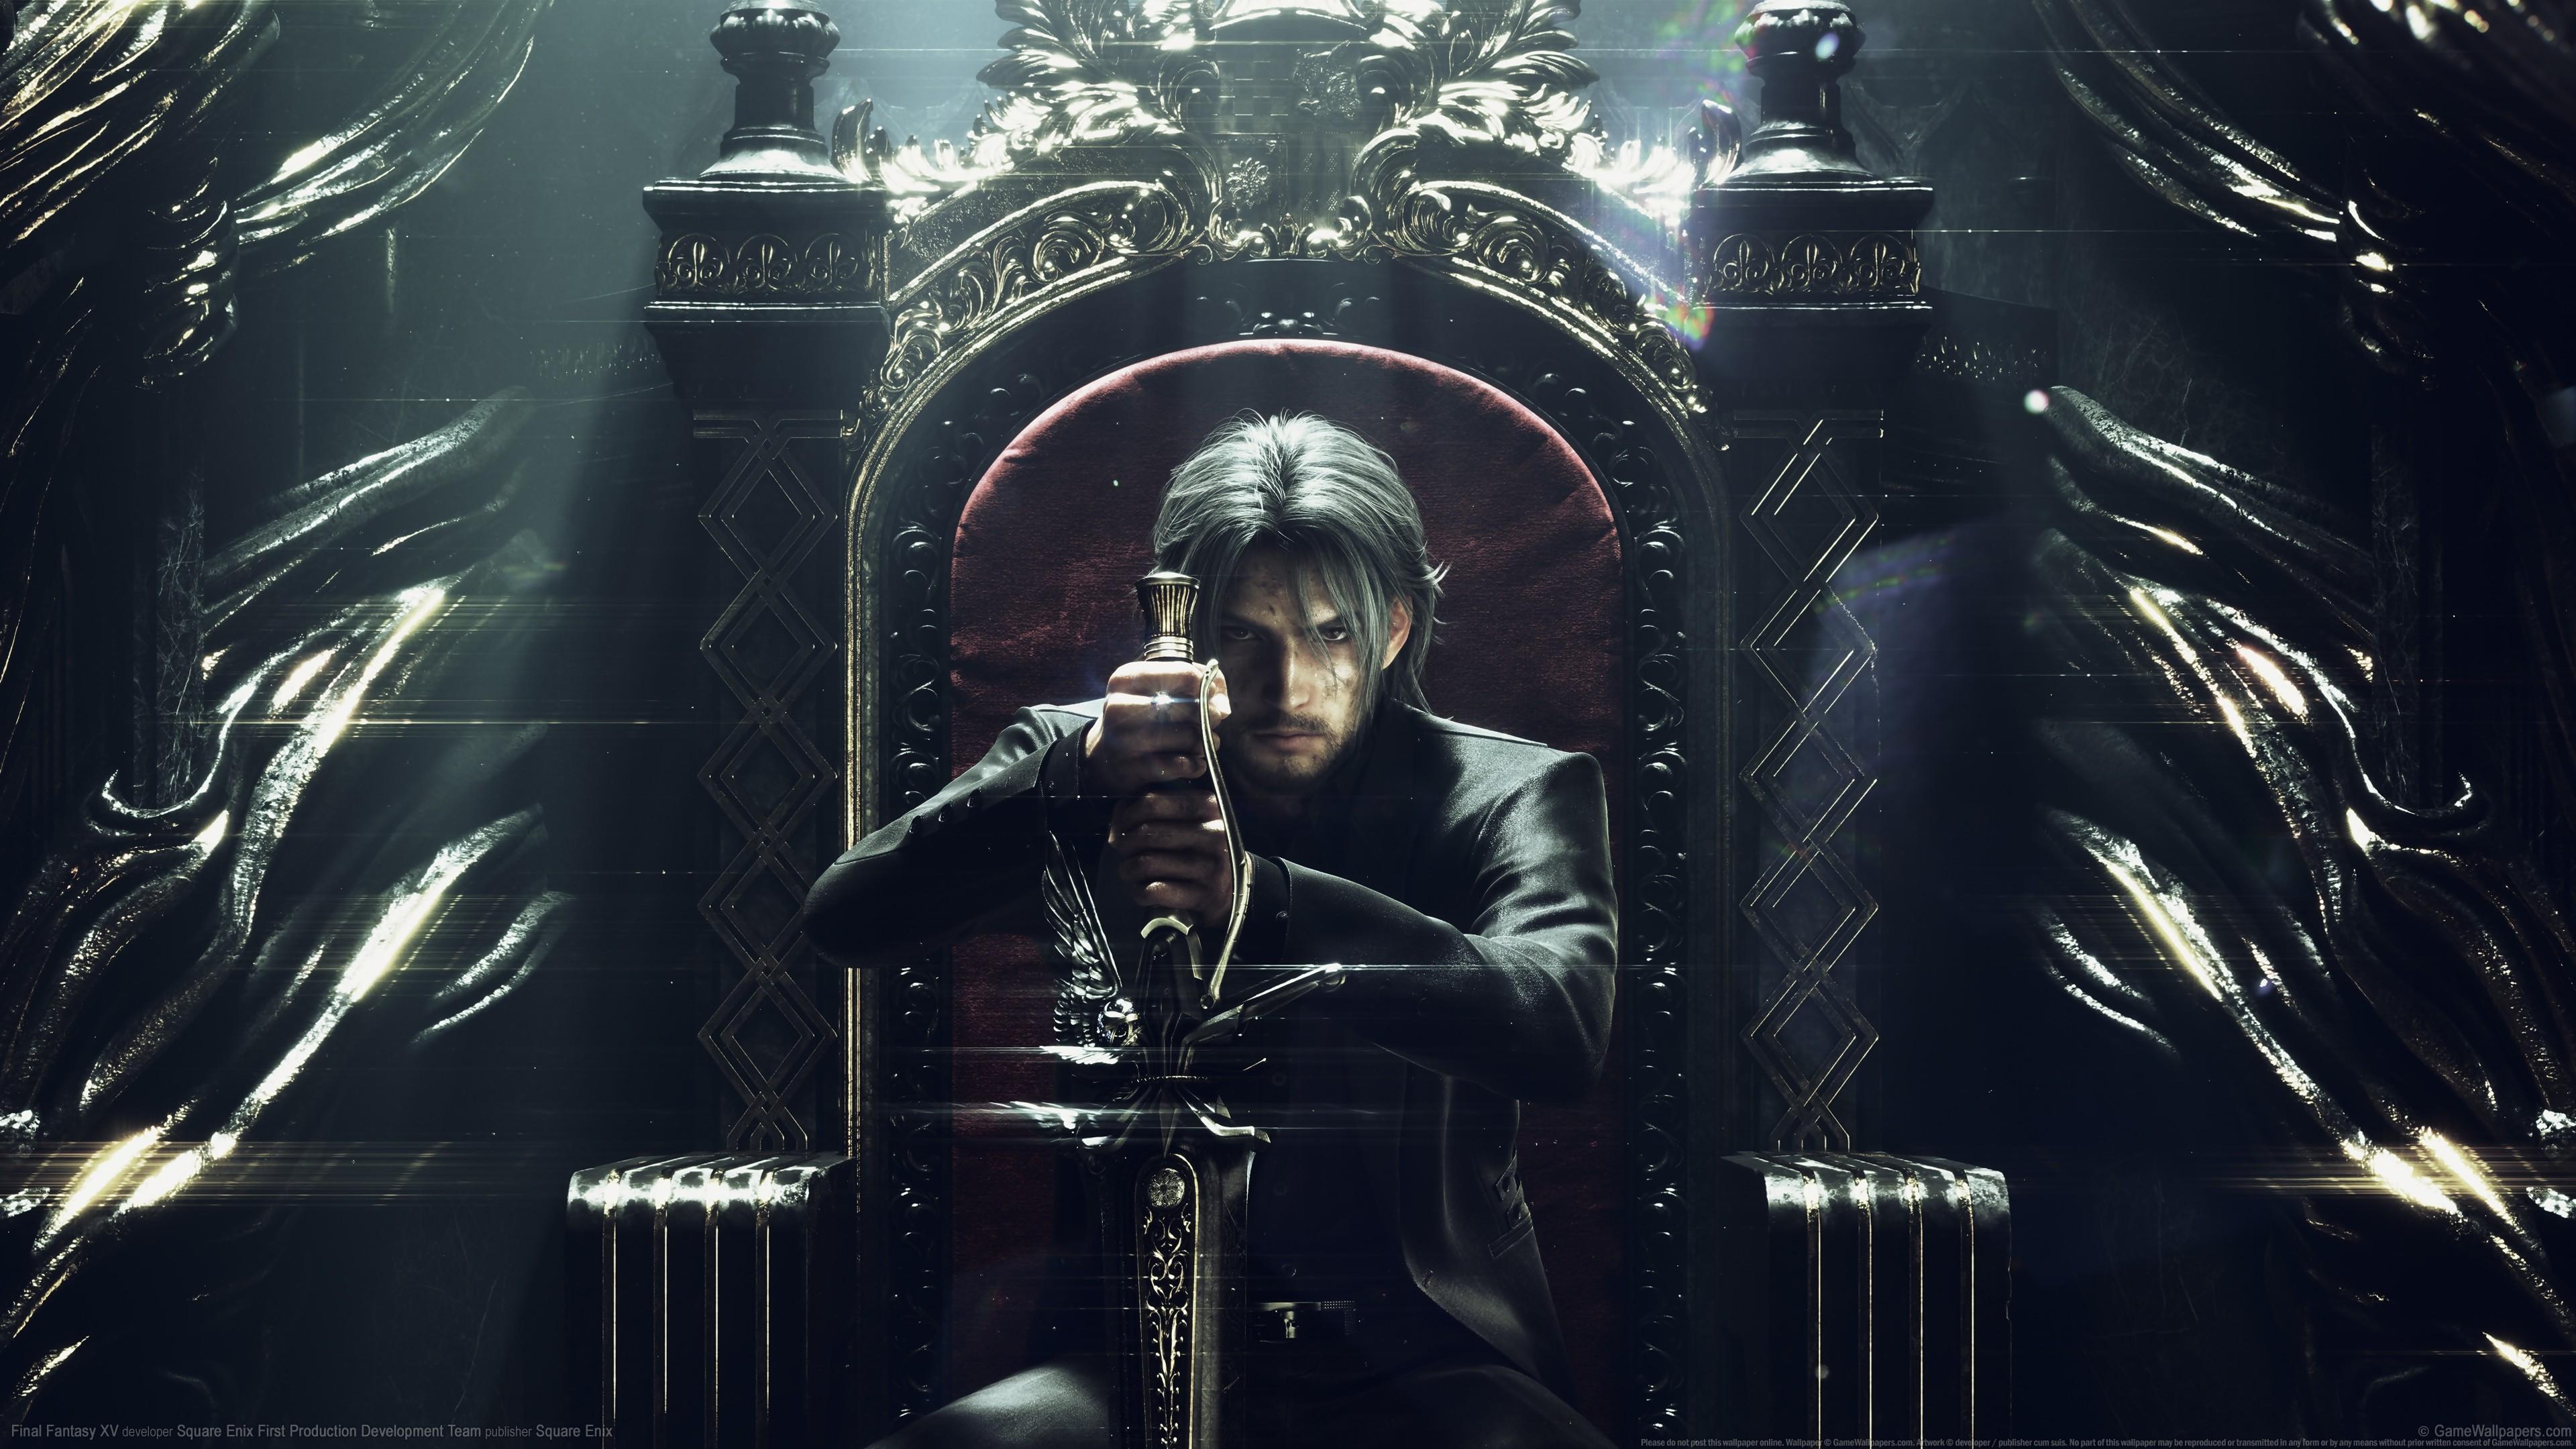 General 3840x2160 video games digital art Final Fantasy XV throne men sword Square Enix Final Fantasy Noctis